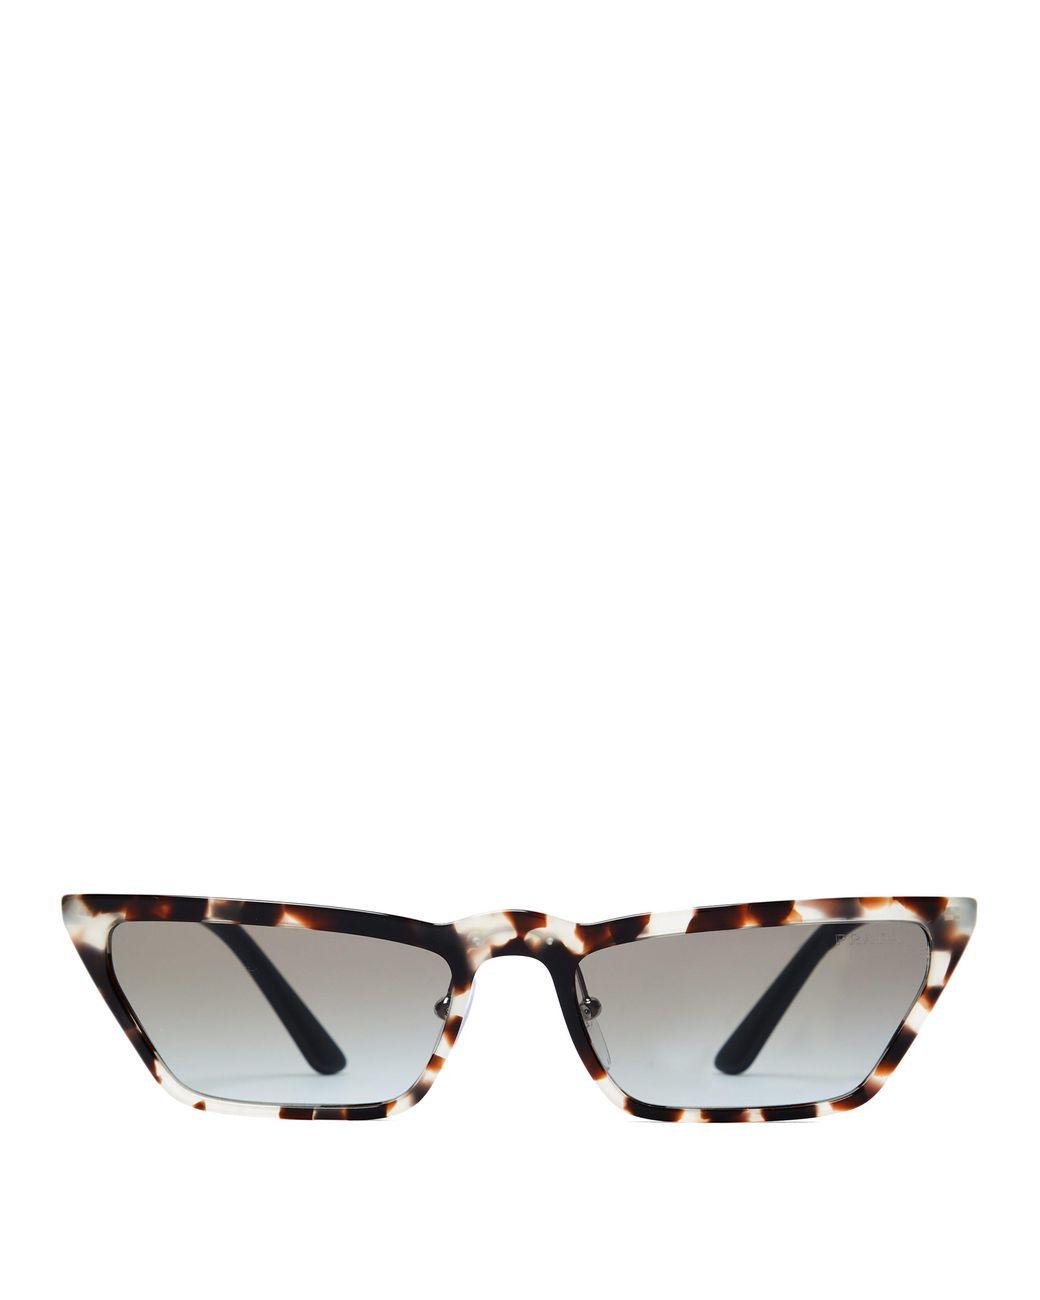 3342490f8a4 Prada Ultravox Rectangular Acetate Sunglasses - Lyst